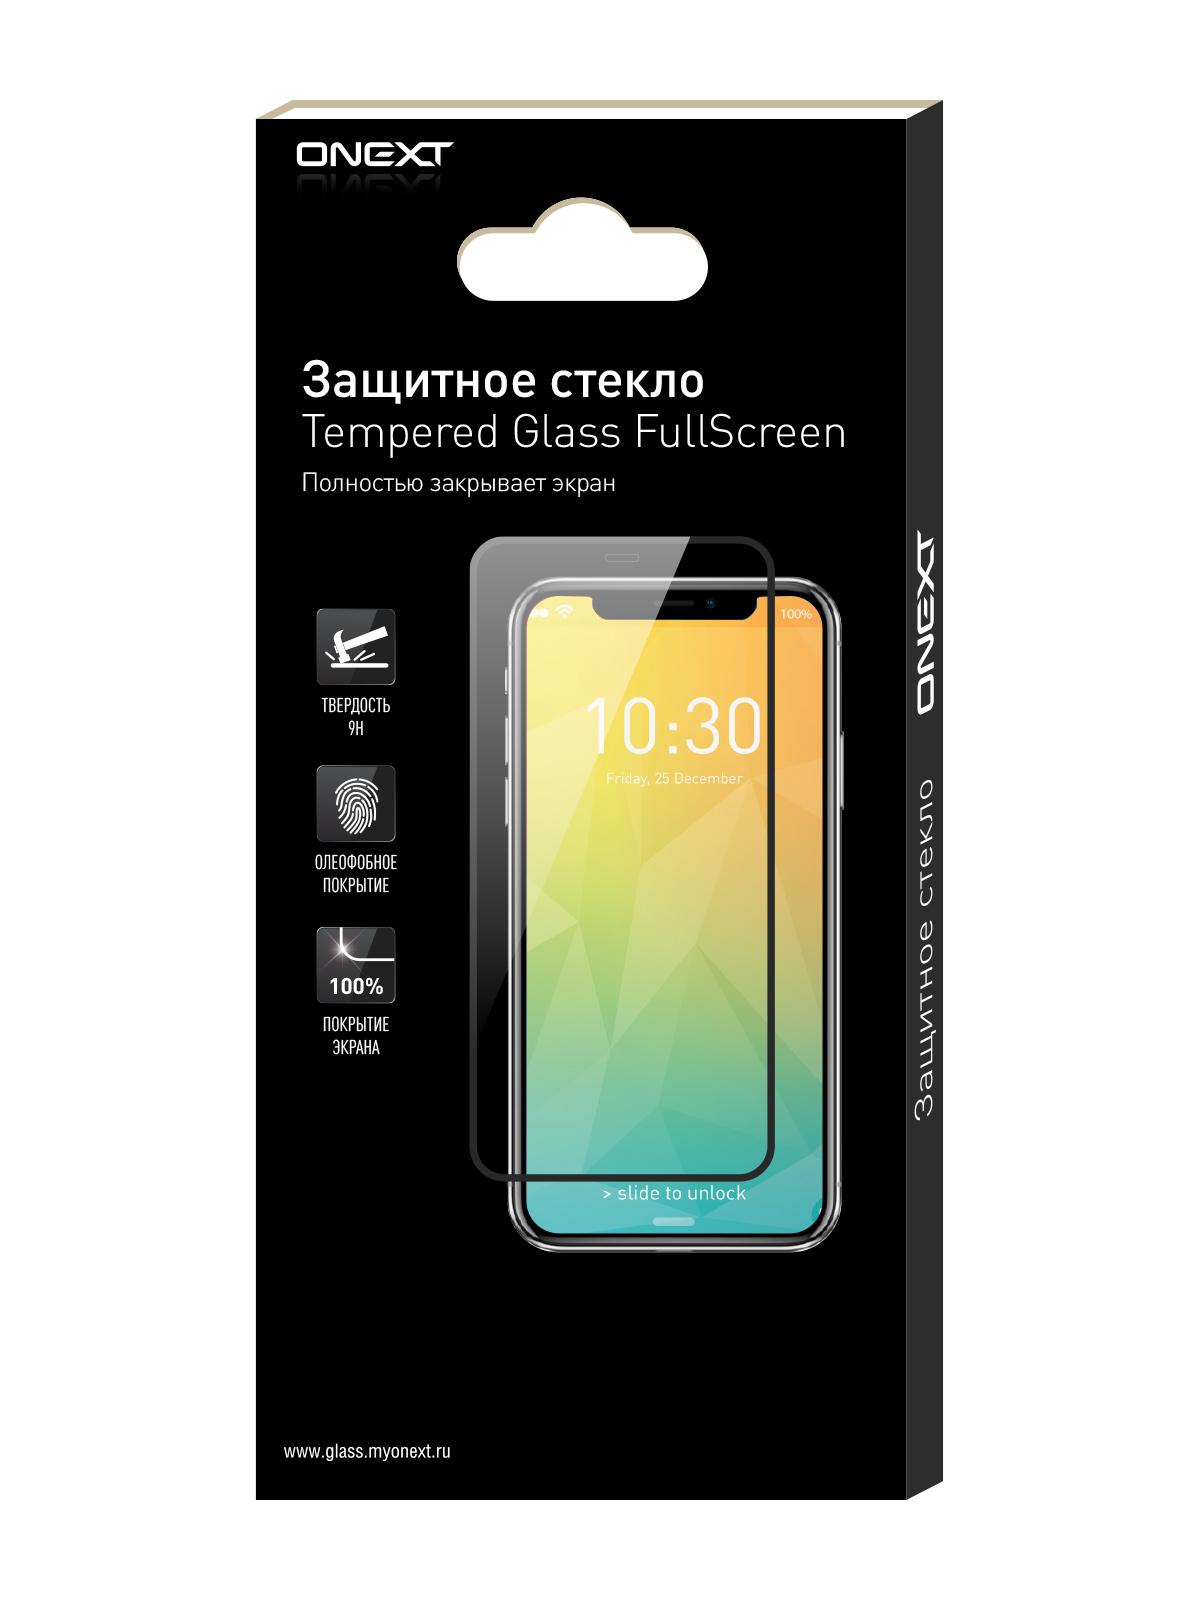 Защитное стекло ONEXT для Xiaomi Redmi Note 5 Plus Gold